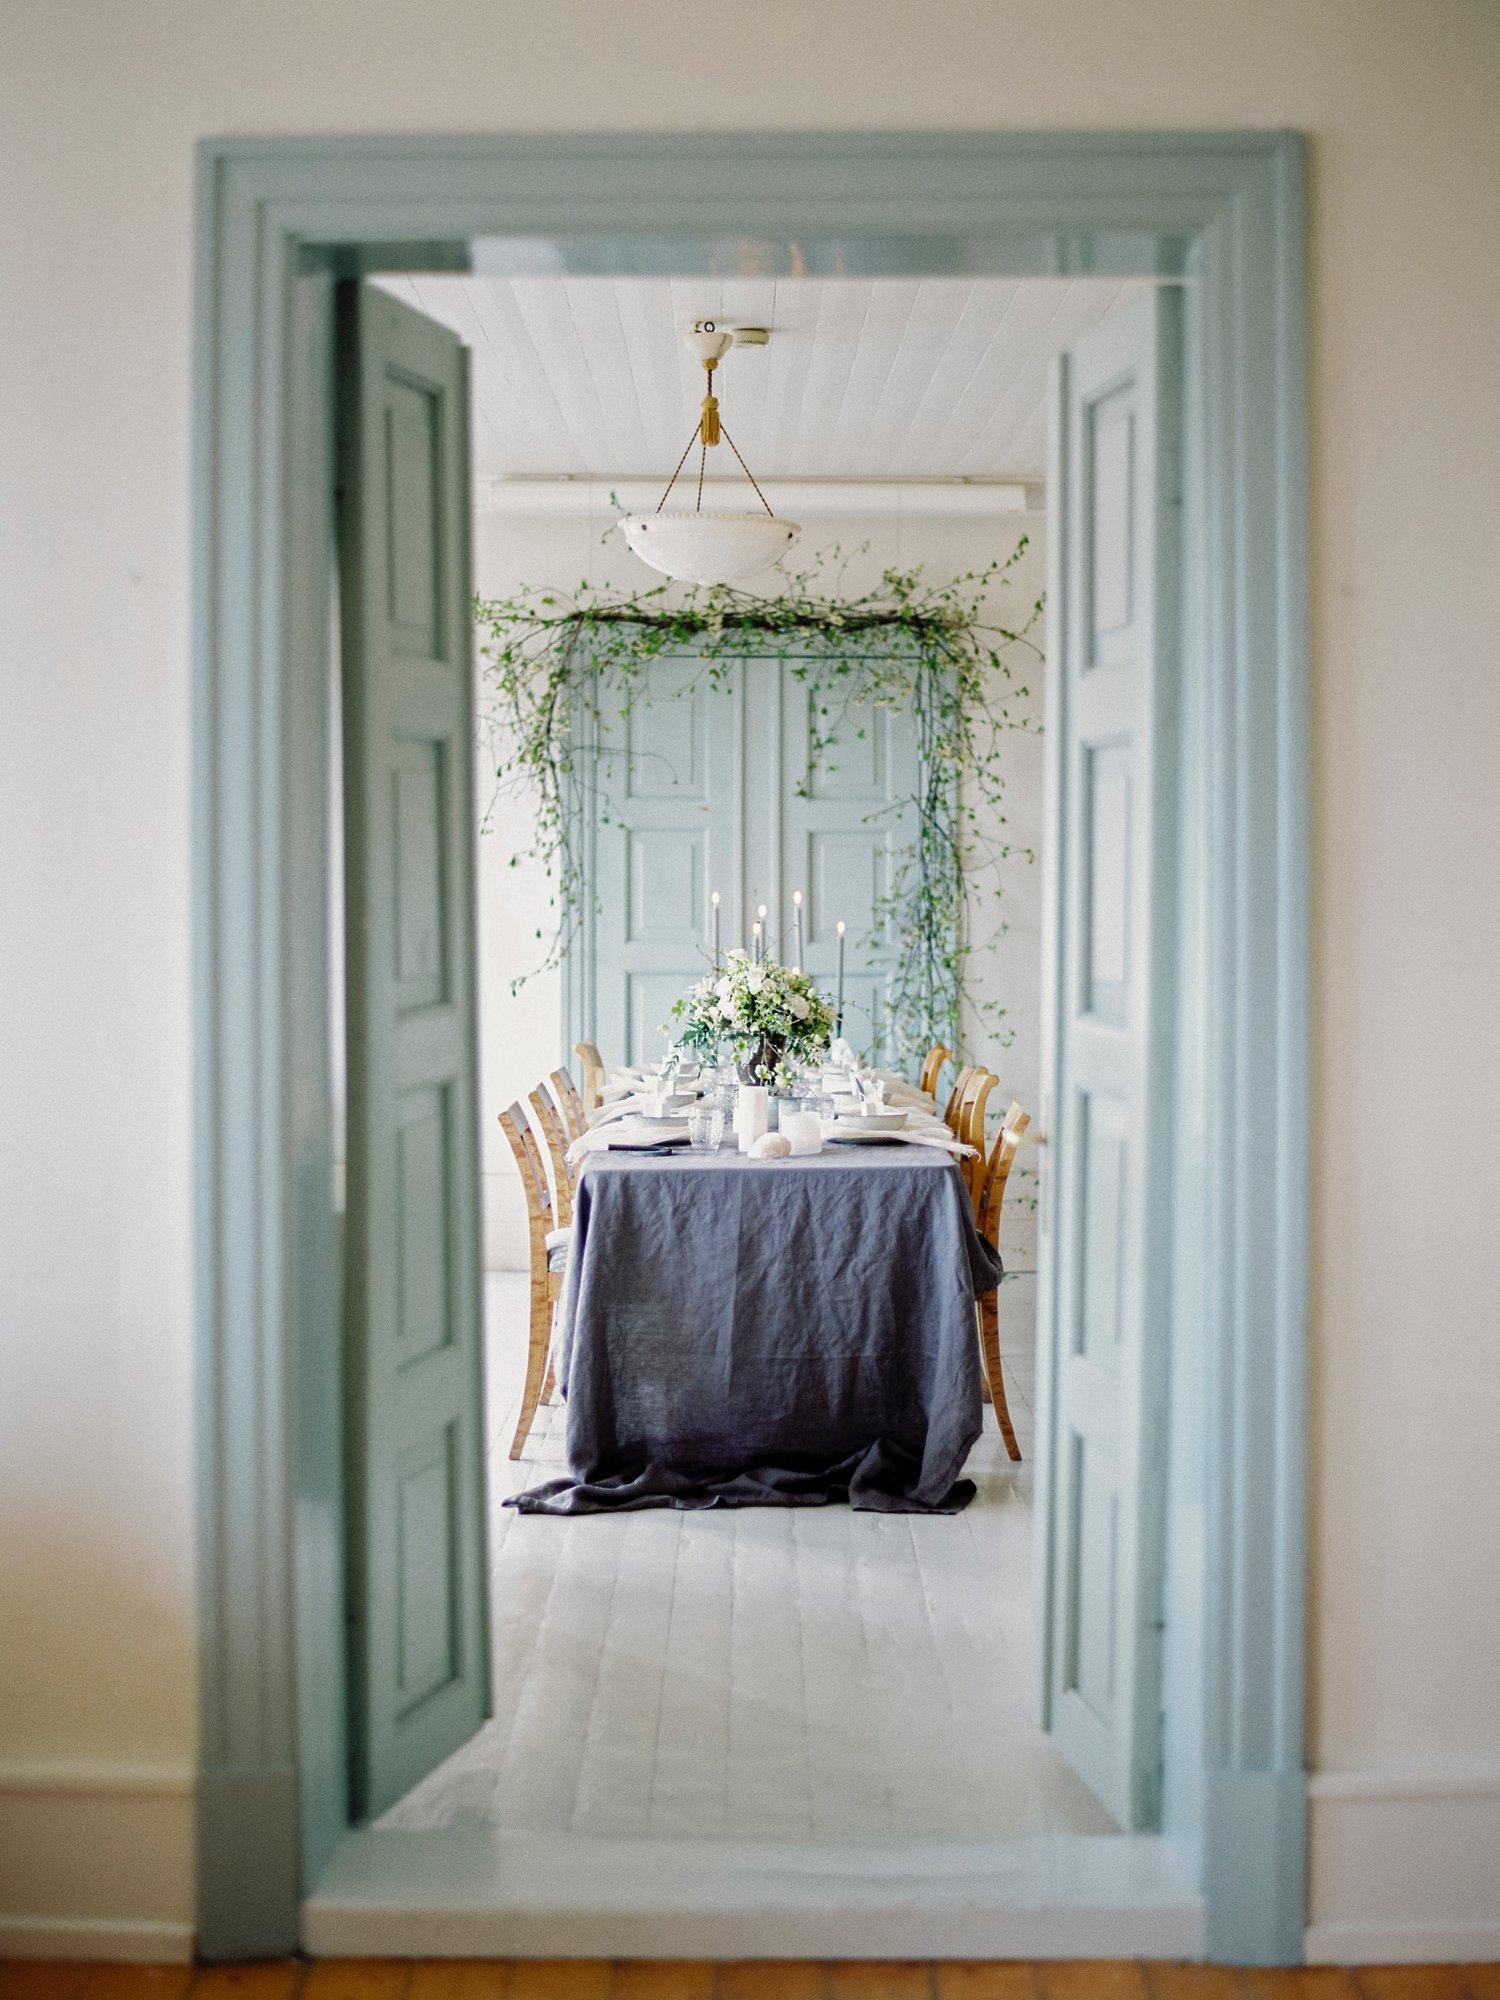 Bryllupsfotograf inspirasjon til bryllup publisert i Nordiske Bryllup Magasin Årvoll gård Oslo